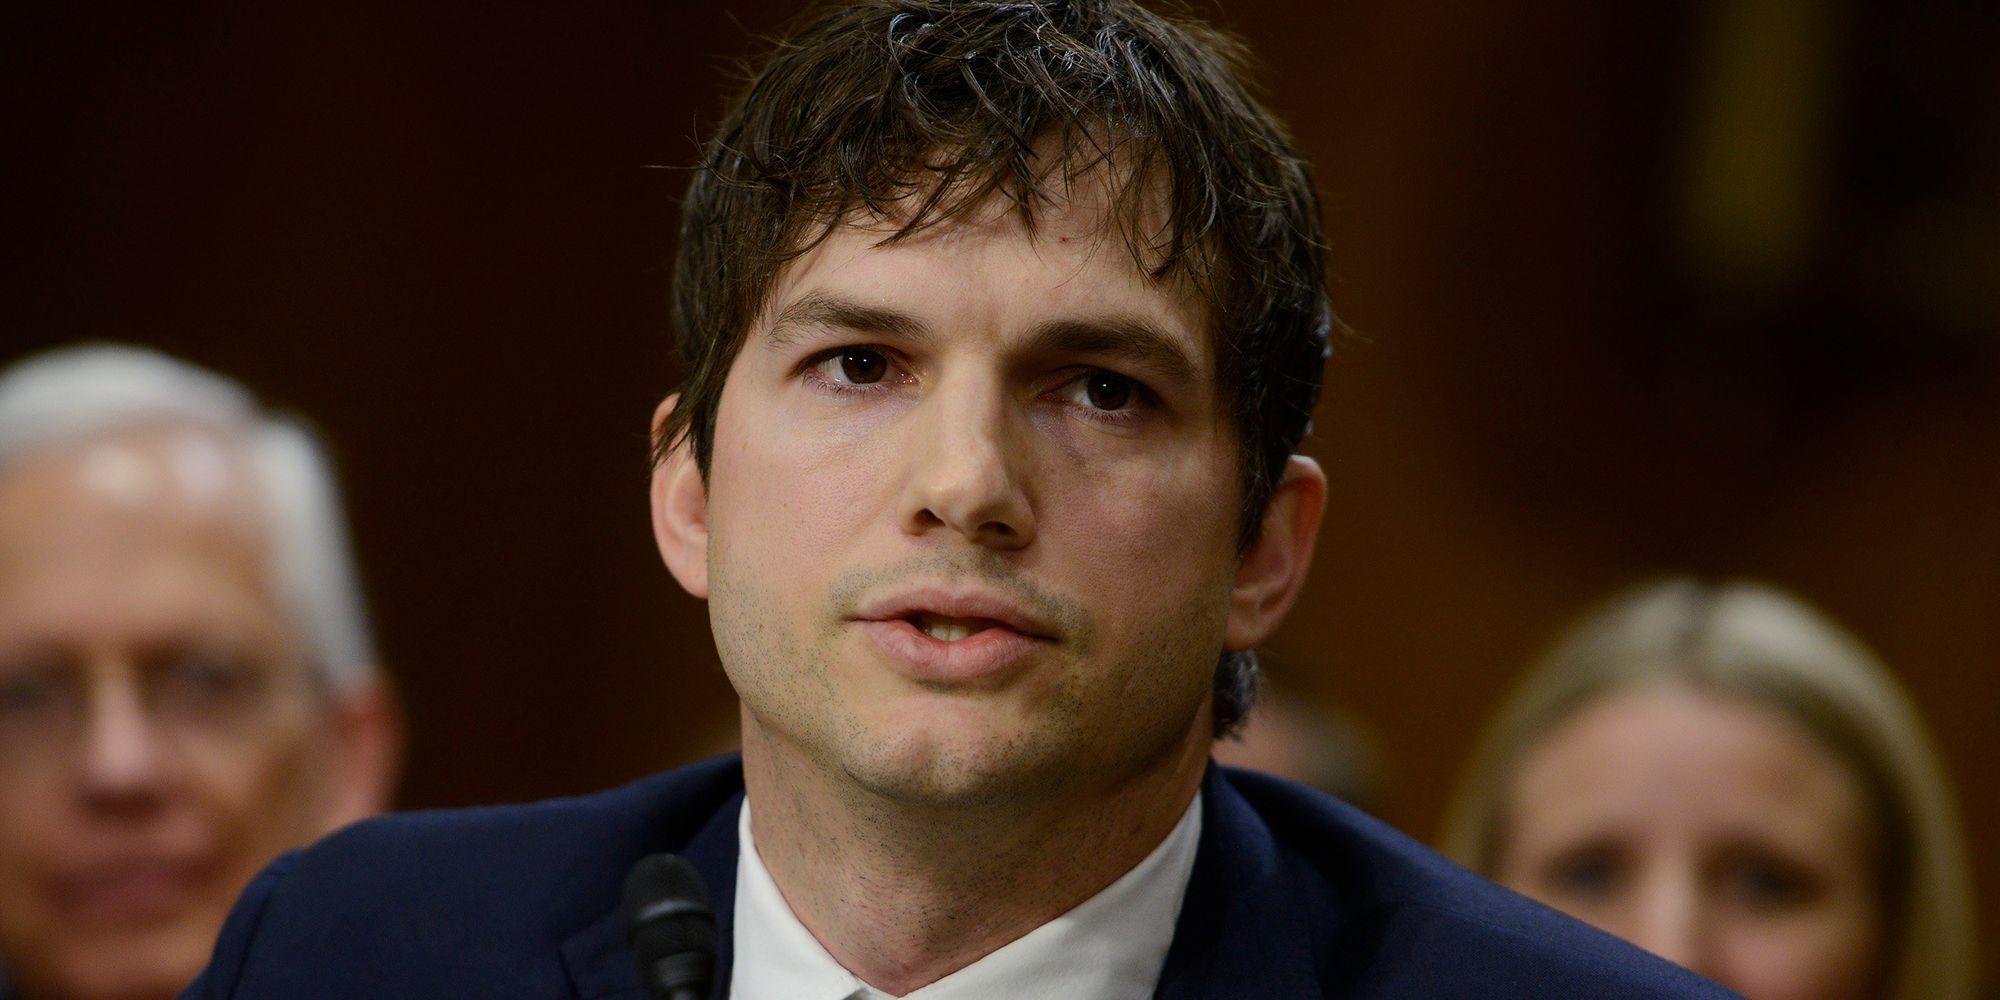 Ashton Kutcher Gives Emotional Testimony At Hearing To End ...